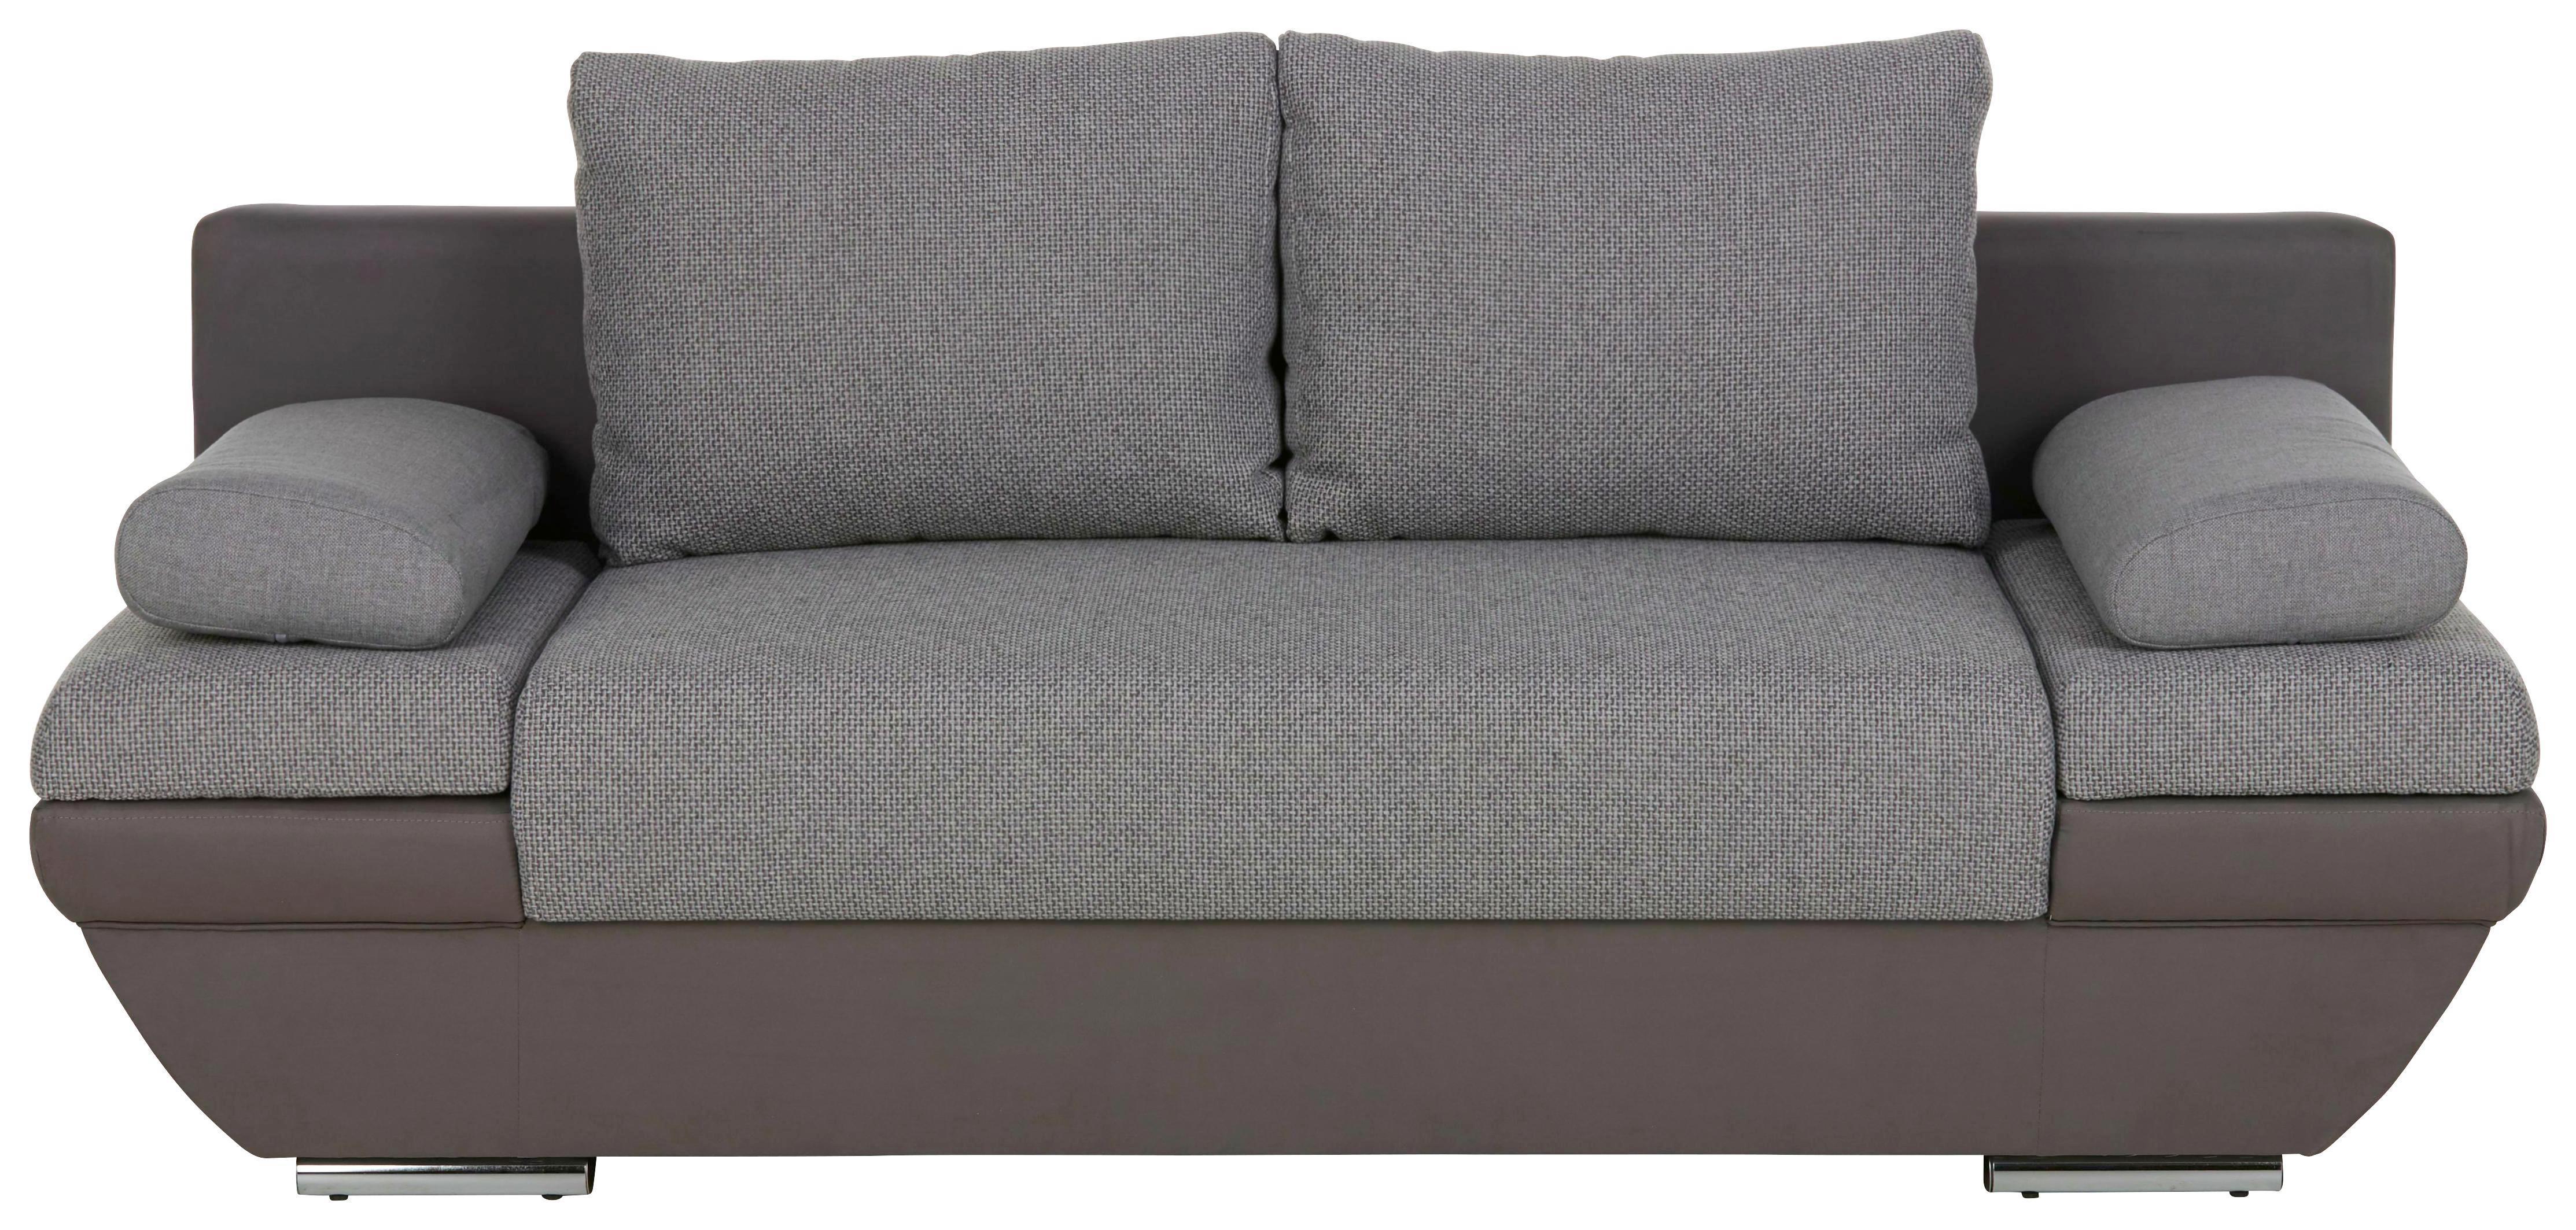 SCHLAFSOFA Grau mit Bettkasten - Dunkelgrau/Hellgrau, Textil/Metall (205/76/95cm) - PREMIUM LIVING